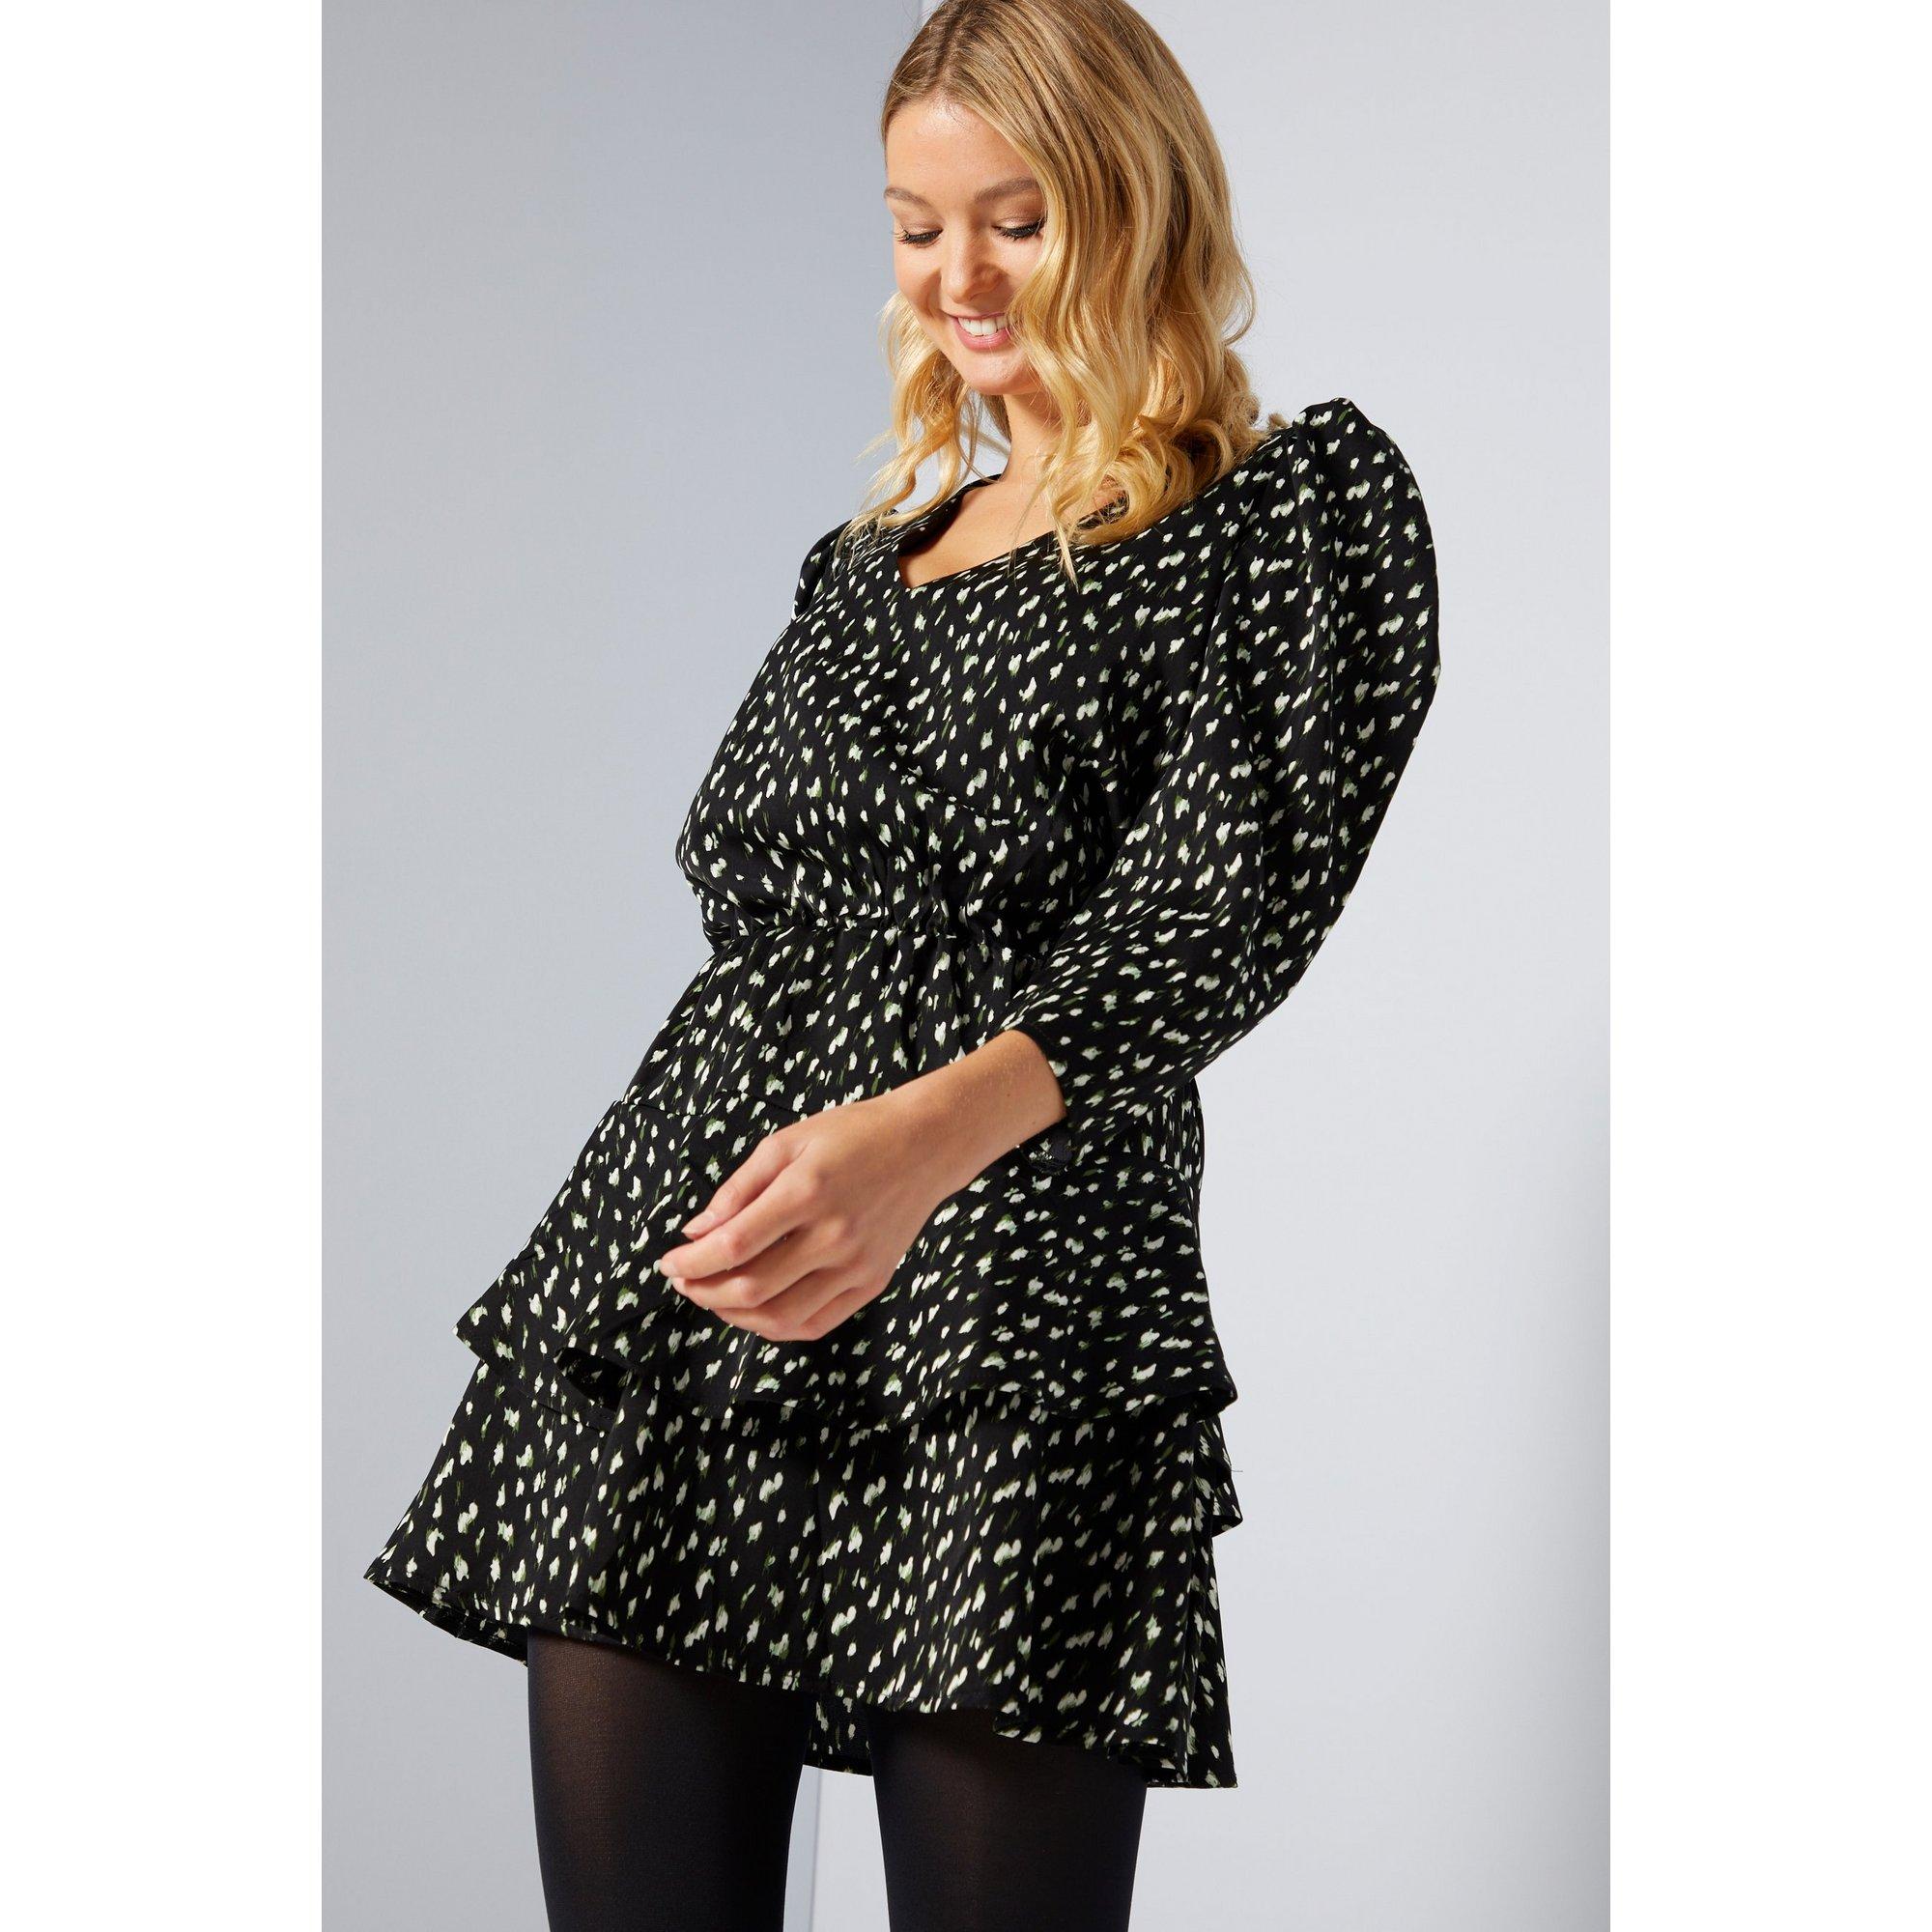 Image of AX Paris Black/White Polka Dot Ruffle Hem Dress